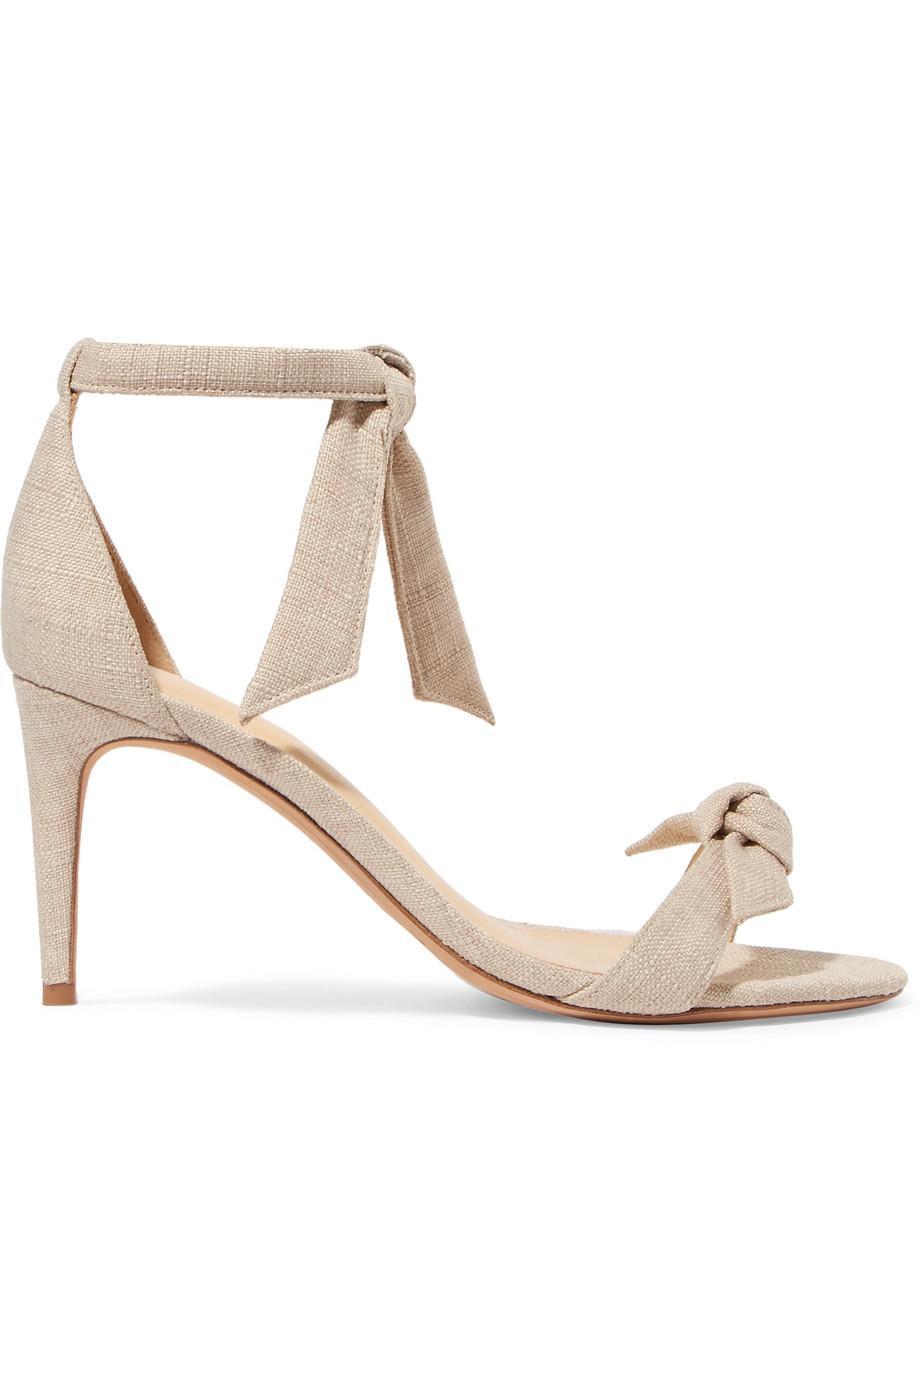 Clarita Bow-embellished Linen Sandals - Ecru Alexandre Birman X6uXAD